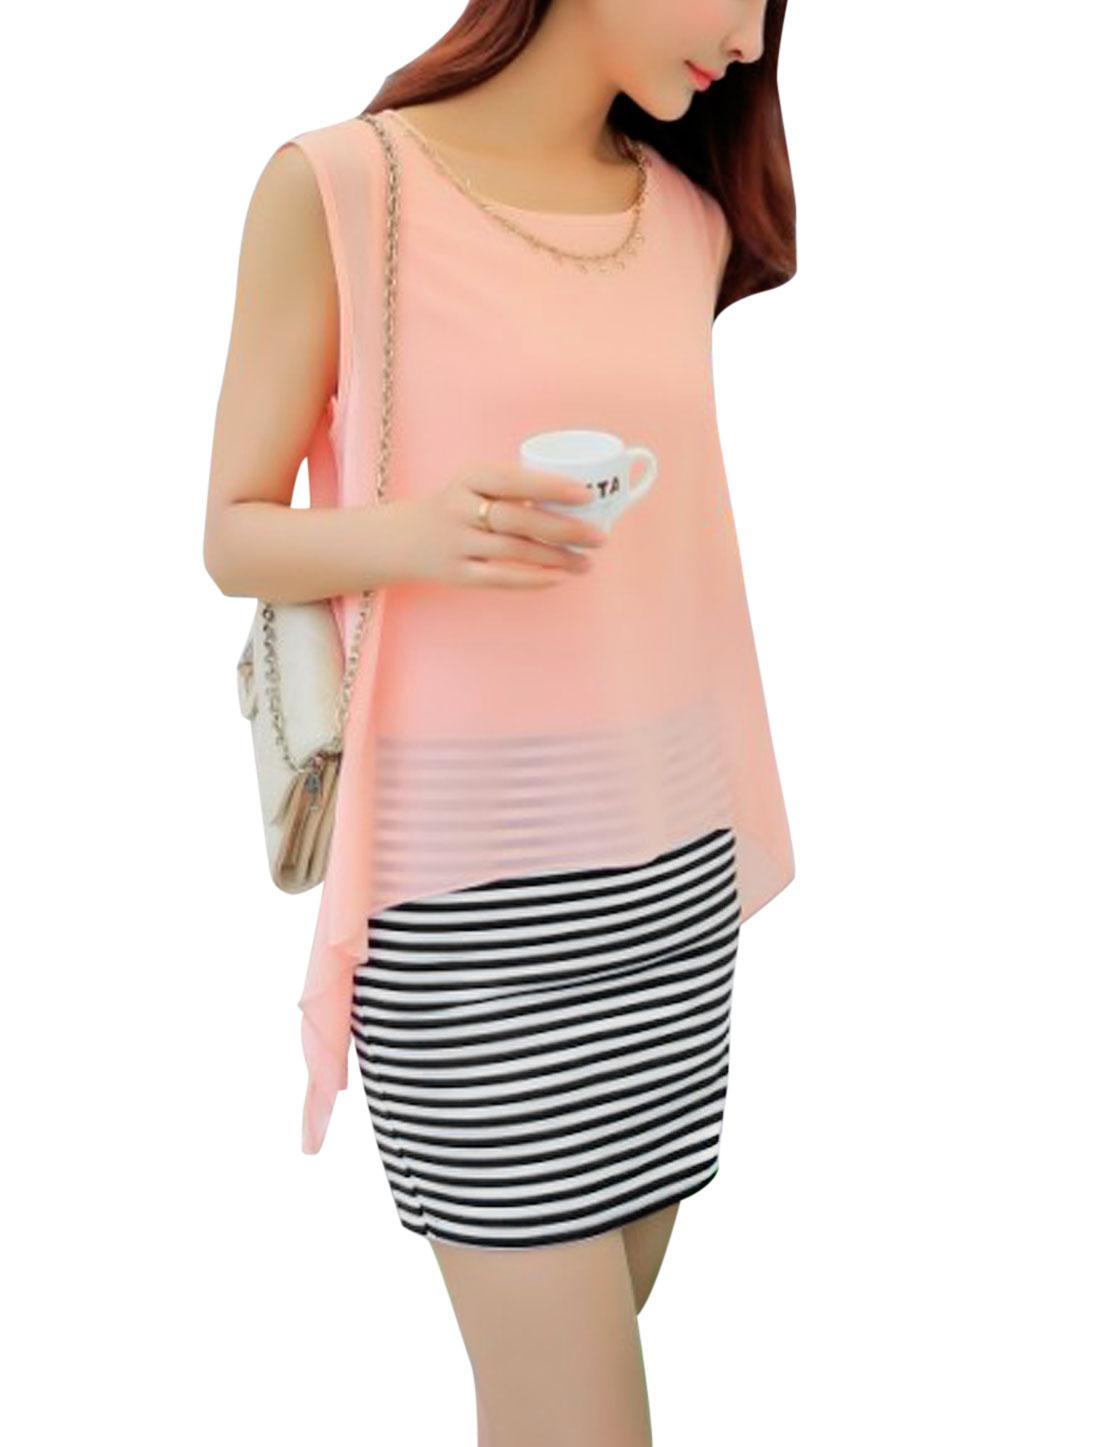 Lady Stripes Pattern Chiffon Panel Design Straight Dress w Necklace Light Pink M